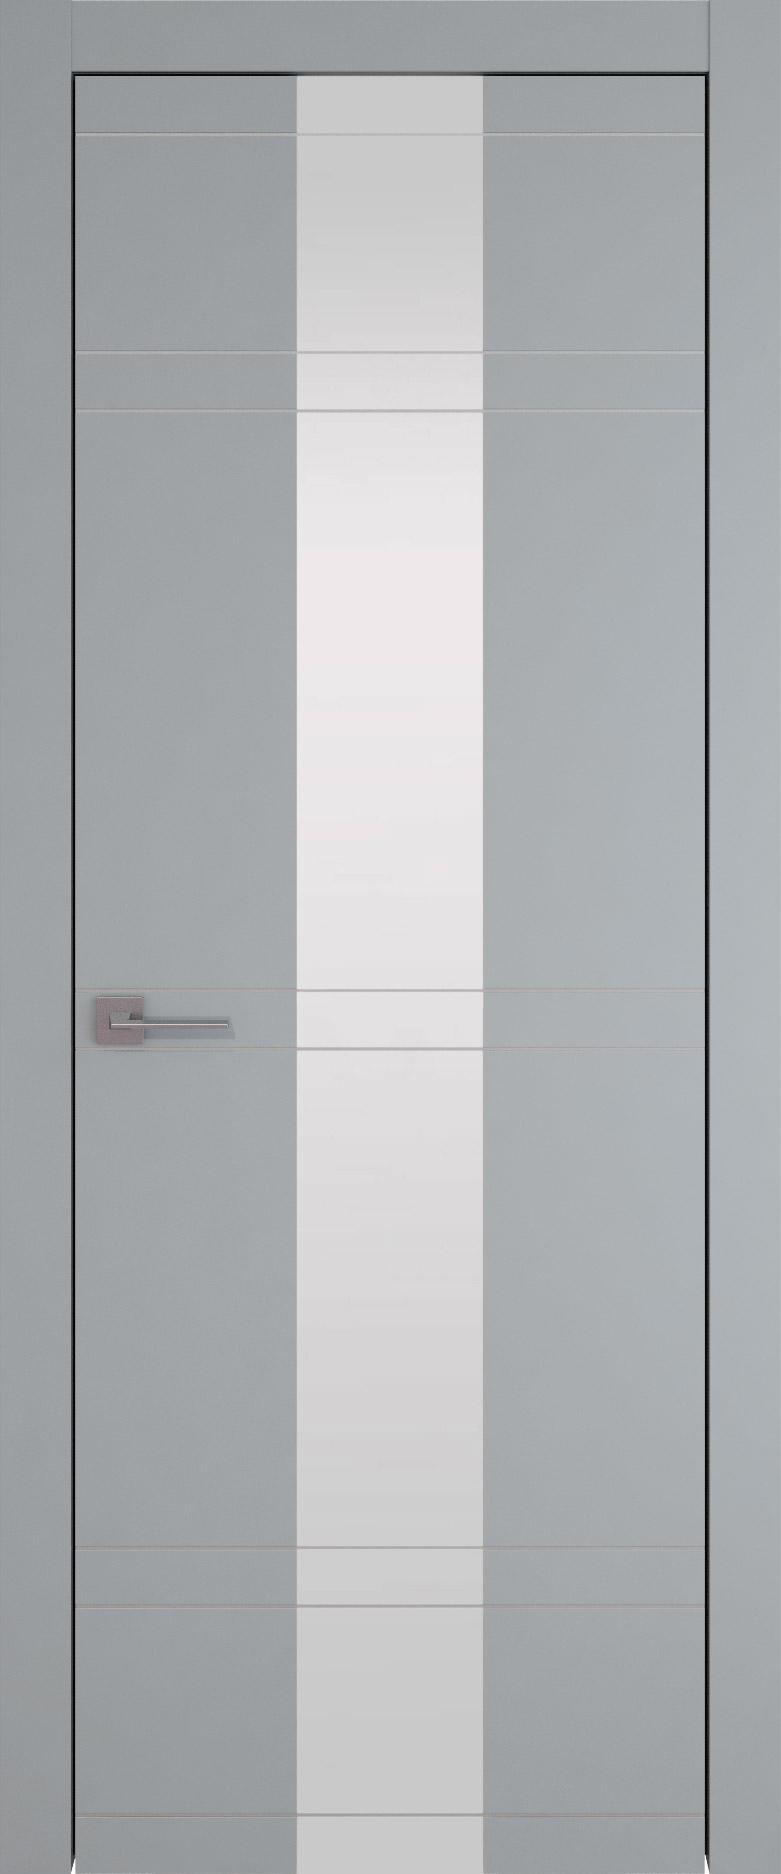 Tivoli Ж-4 цвет - Серебристо-серая эмаль (RAL 7045) Со стеклом (ДО)